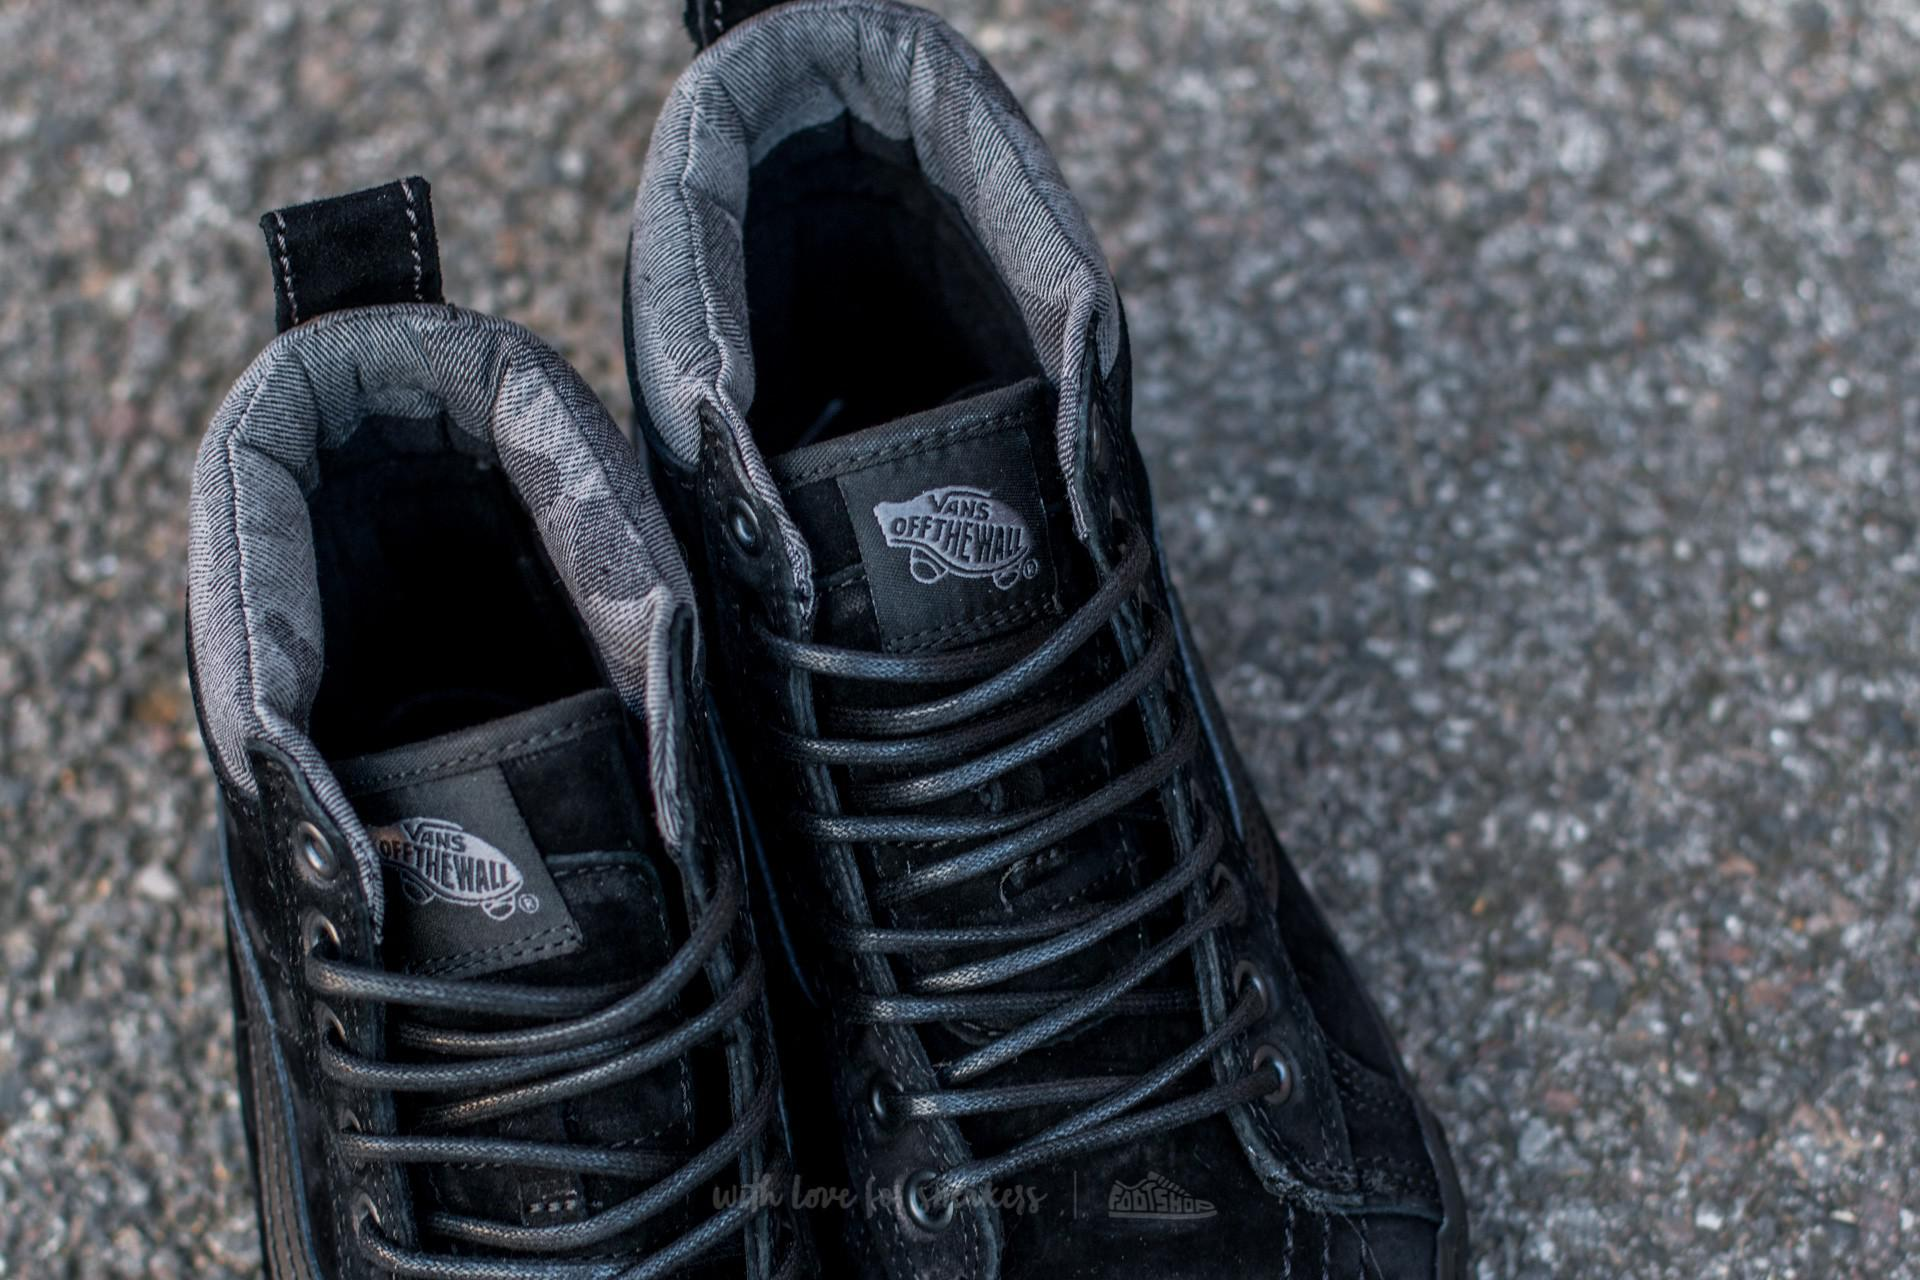 67c43c339d7e Lyst - Vans Sk8-hi Mte (mte) Black  Black  Camo in Black